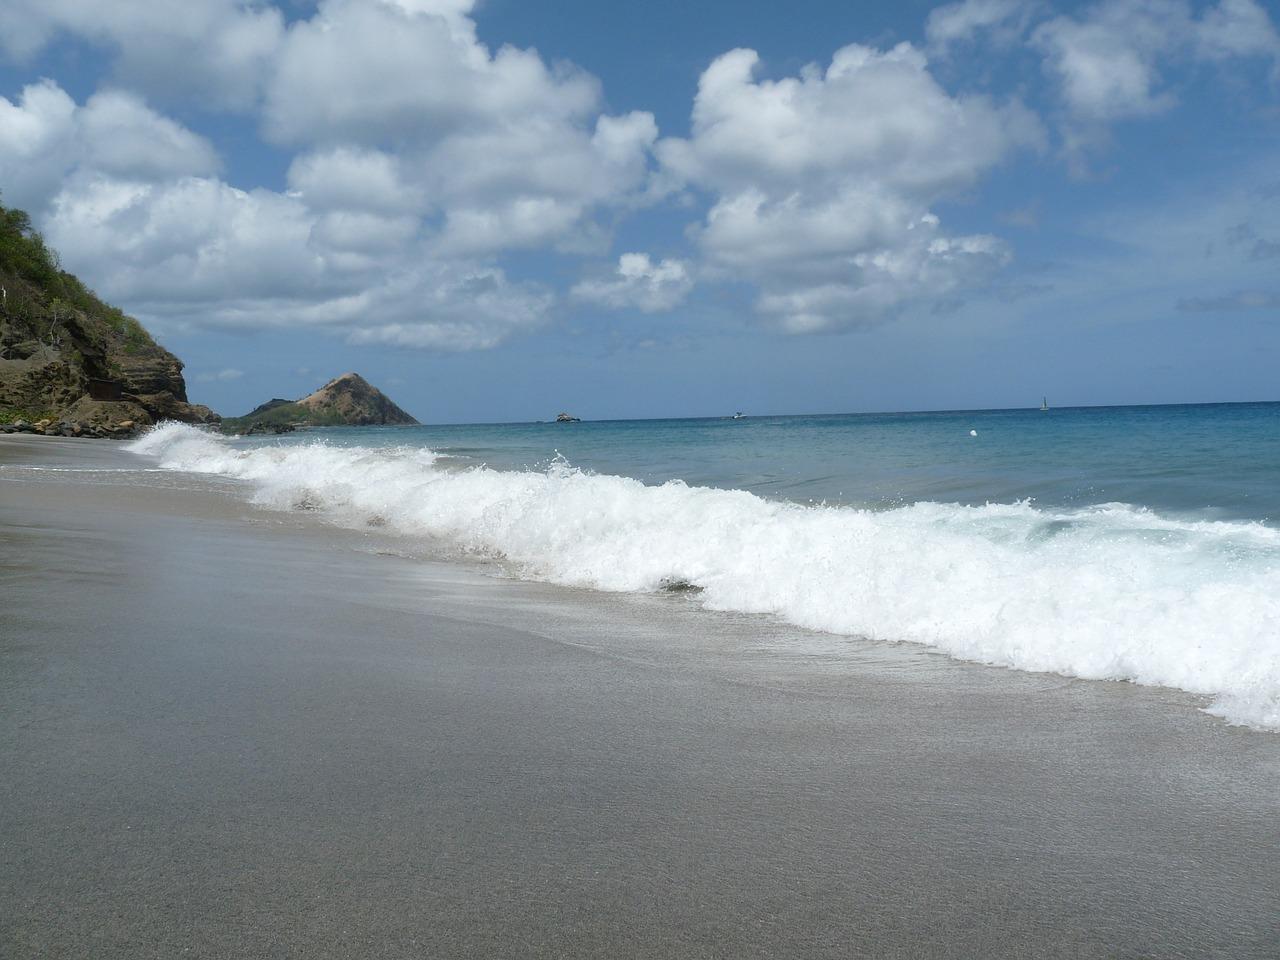 ocean-352156_1280